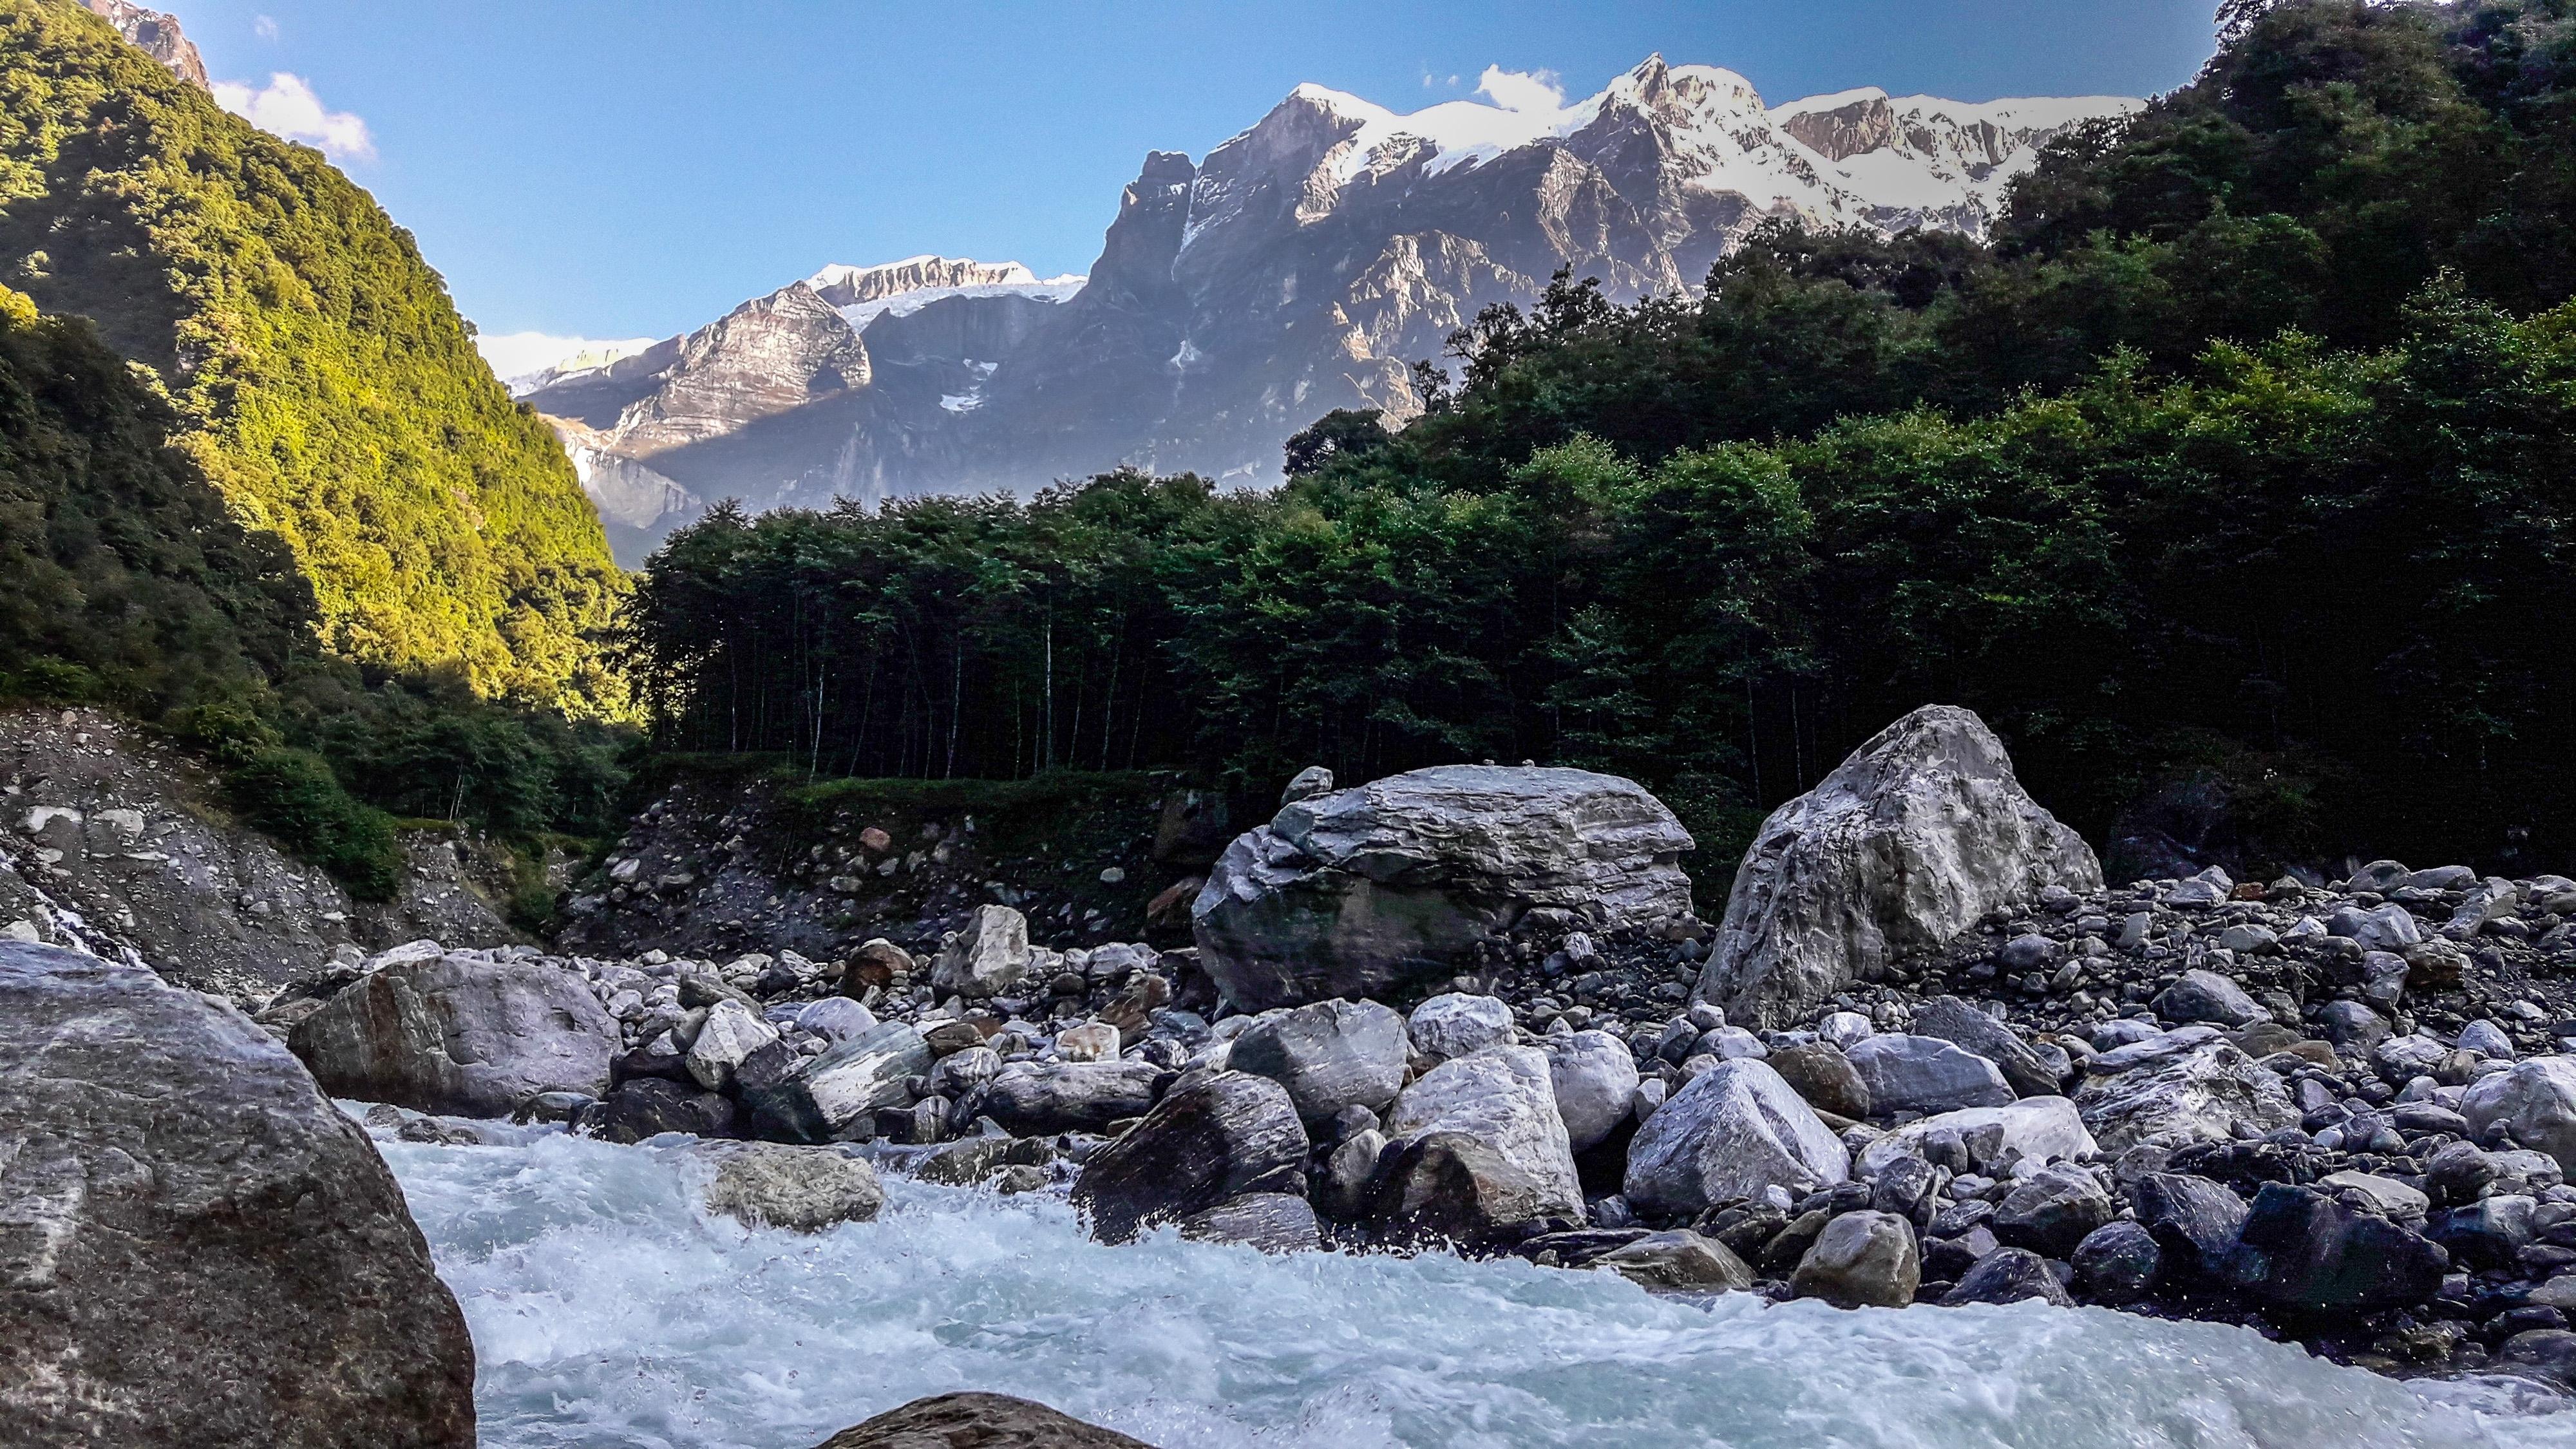 trek-nepals-hidden-glacier-may-bank-holiday-adventure